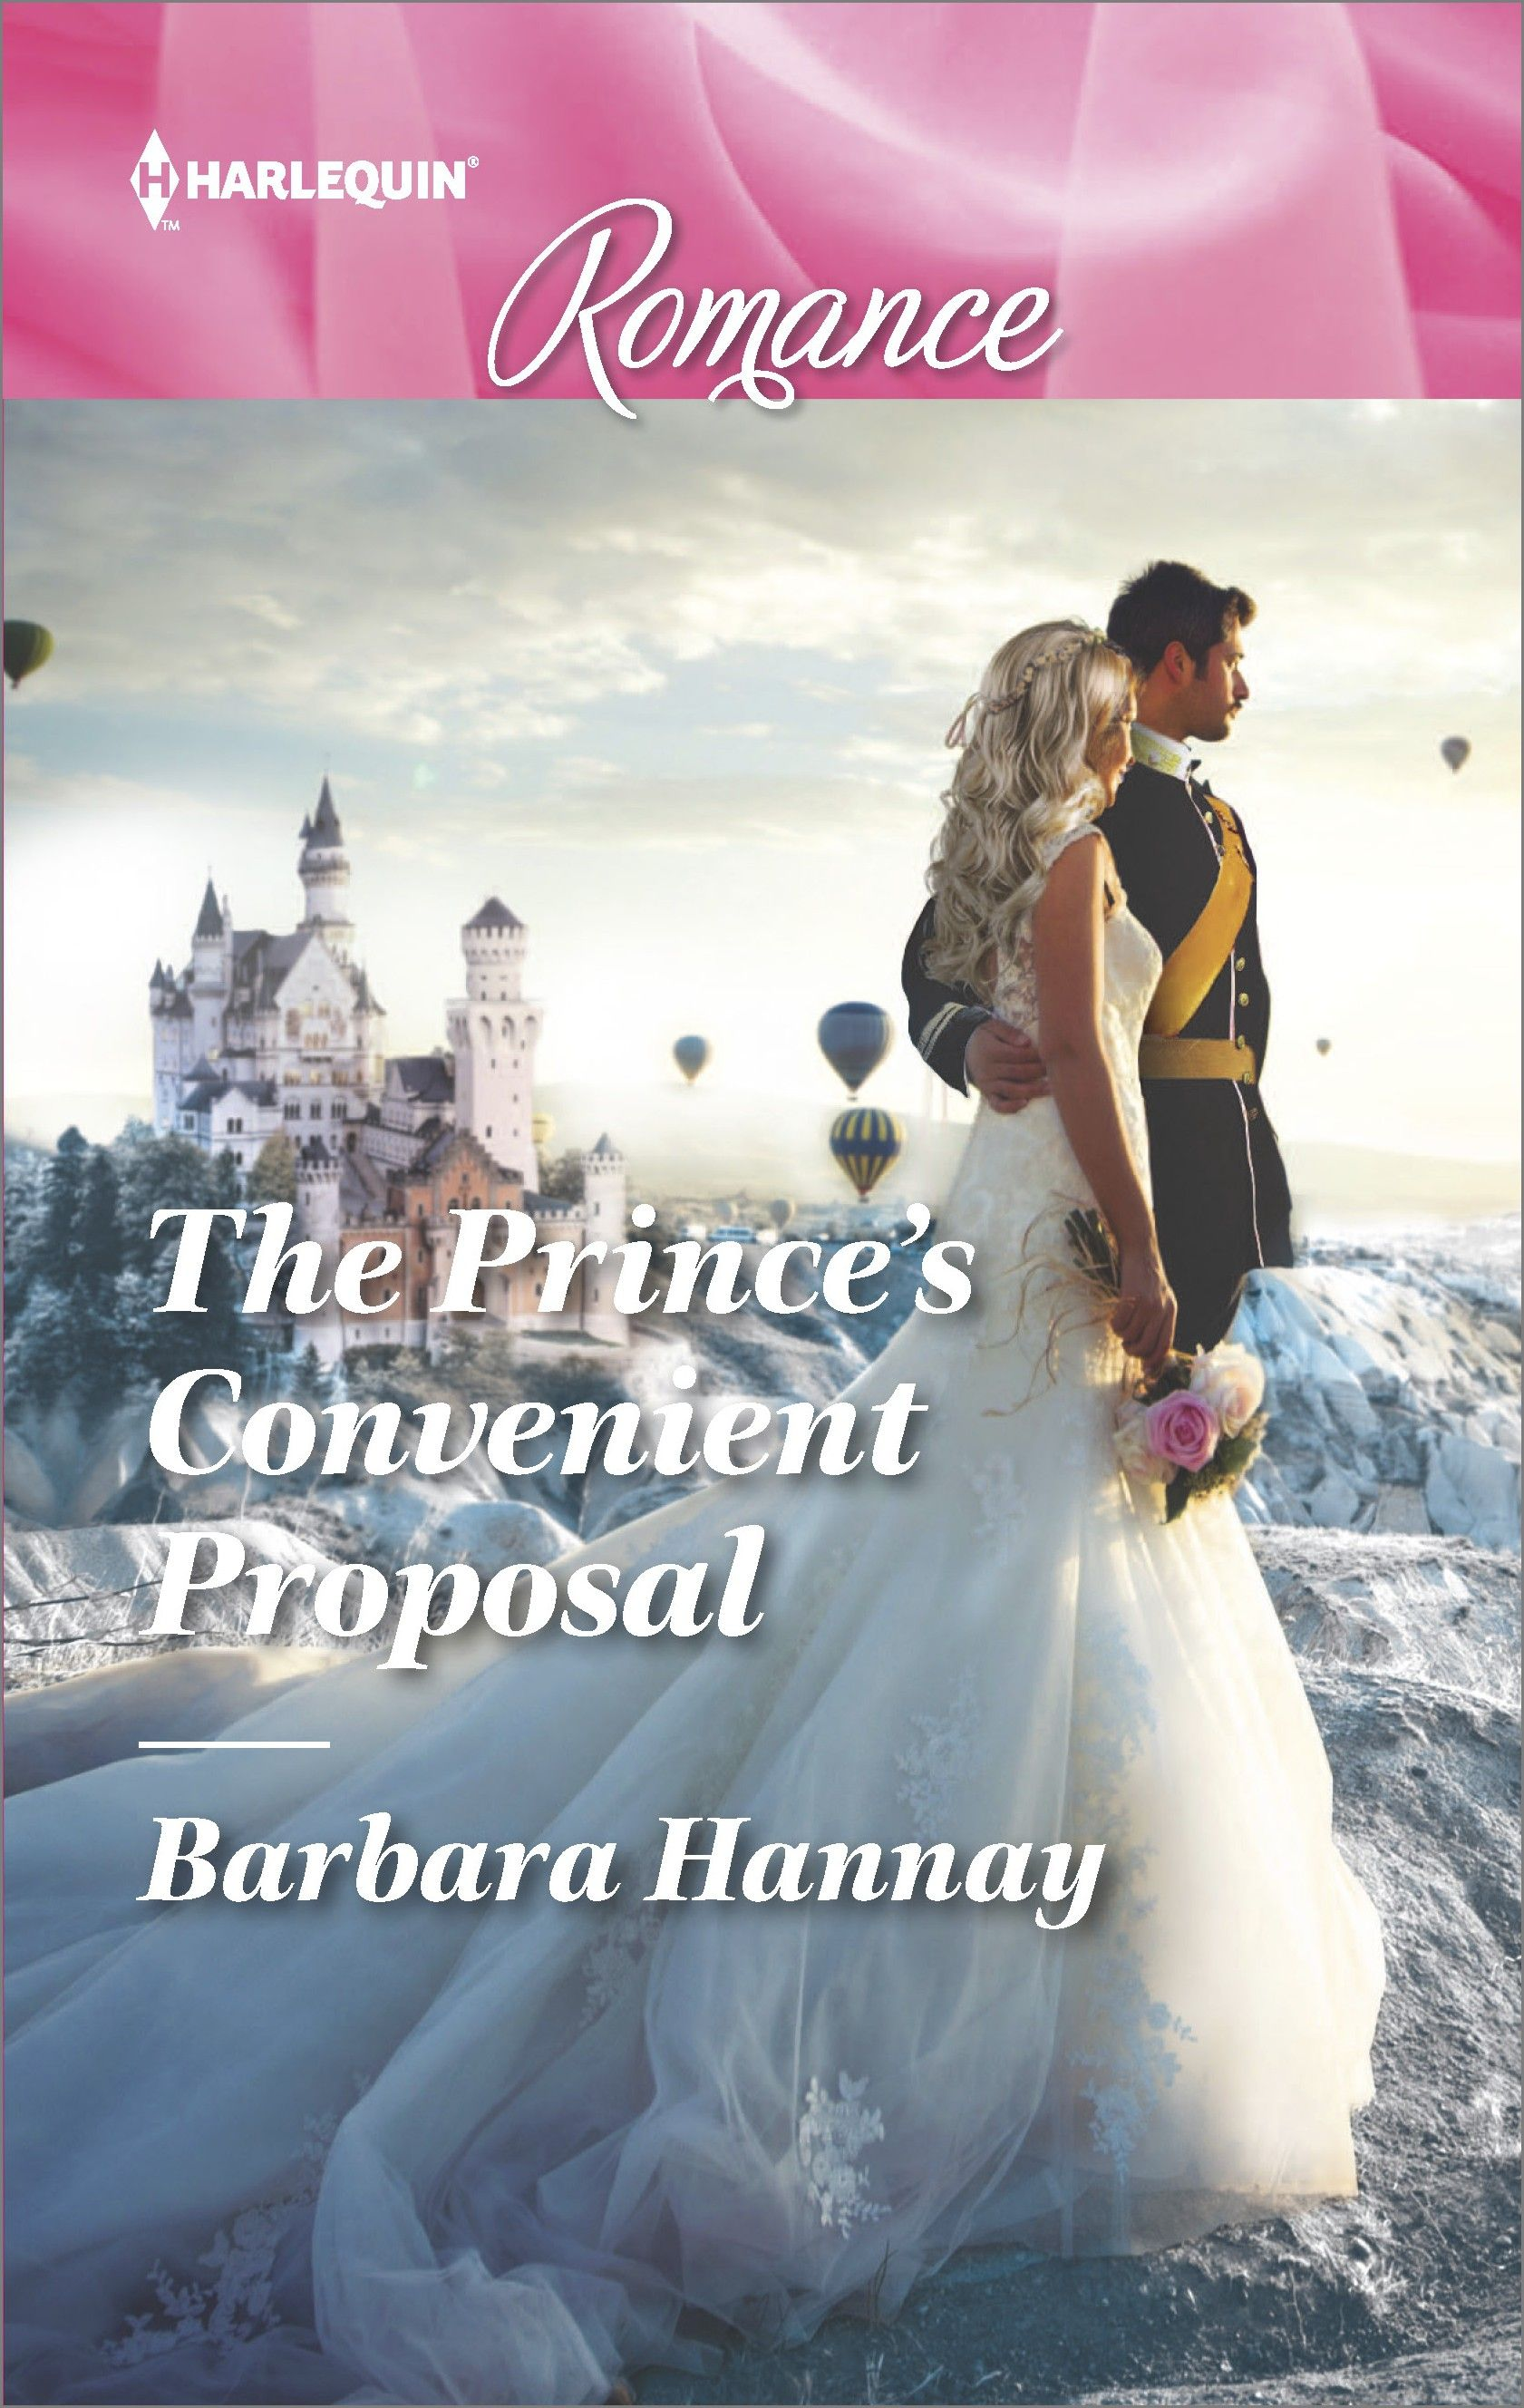 Barbara Hannay - The Prince's Convenient Proposal / #awordfromJoJo #ContemporaryRomance #BarbaraHannay